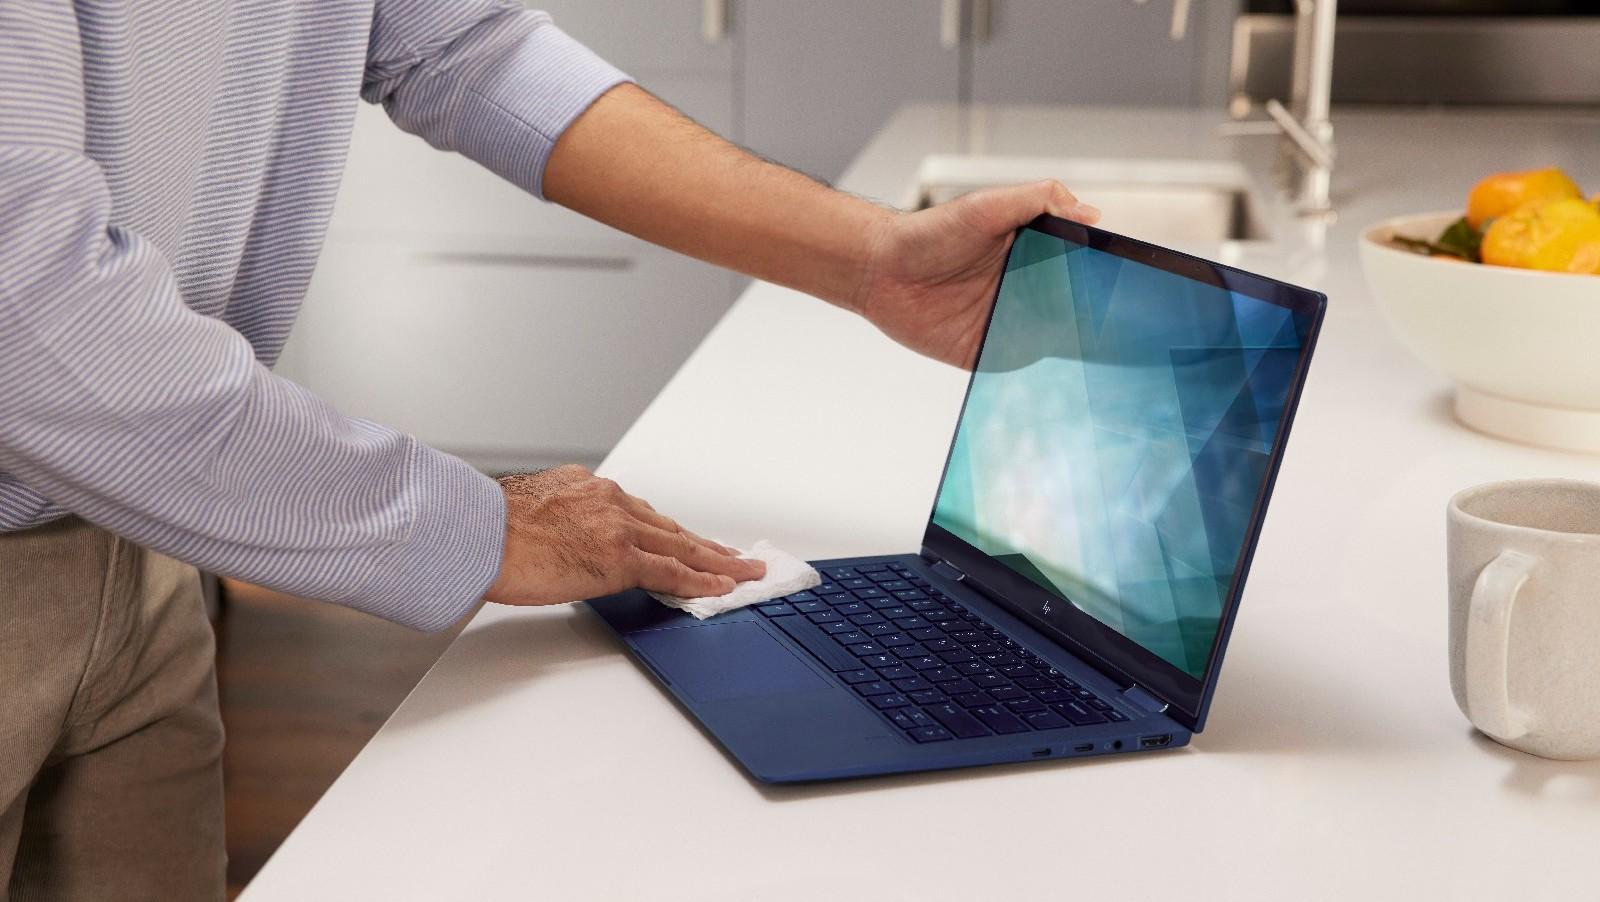 HP-Elite-Dragonfly-G2-laptop-01.jpeg